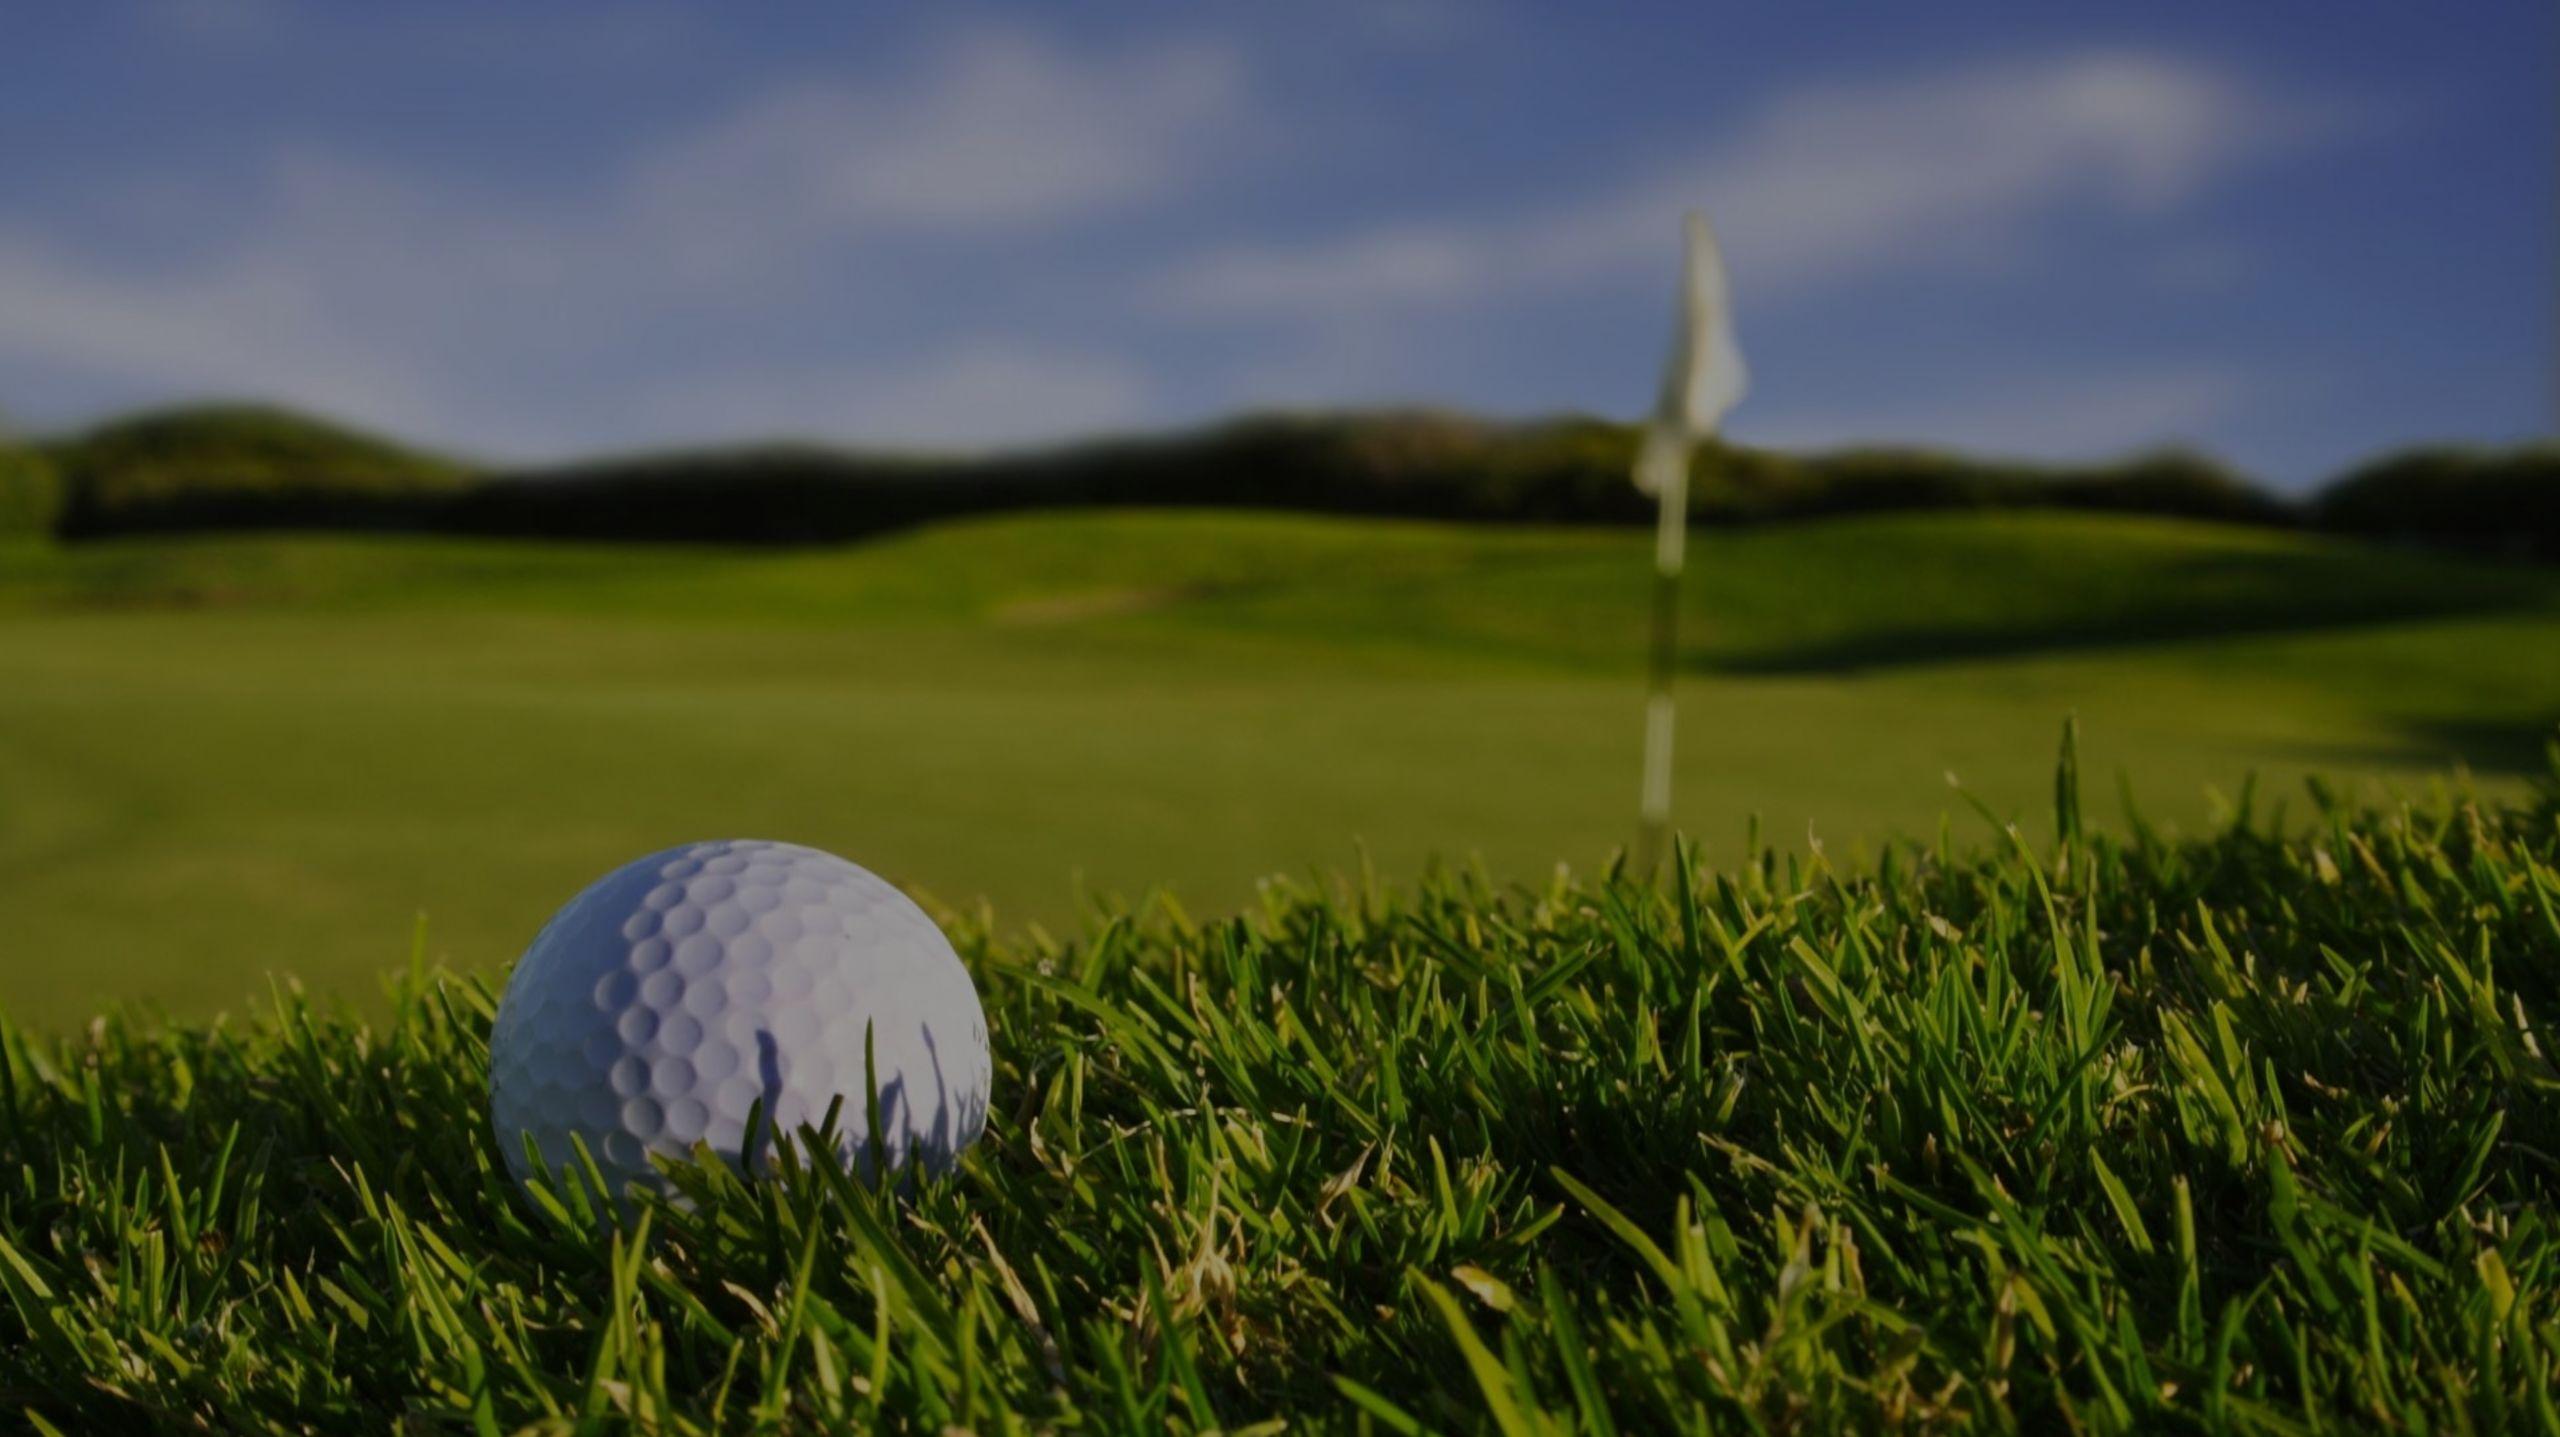 Top 6 Golf Course in Las Vegas